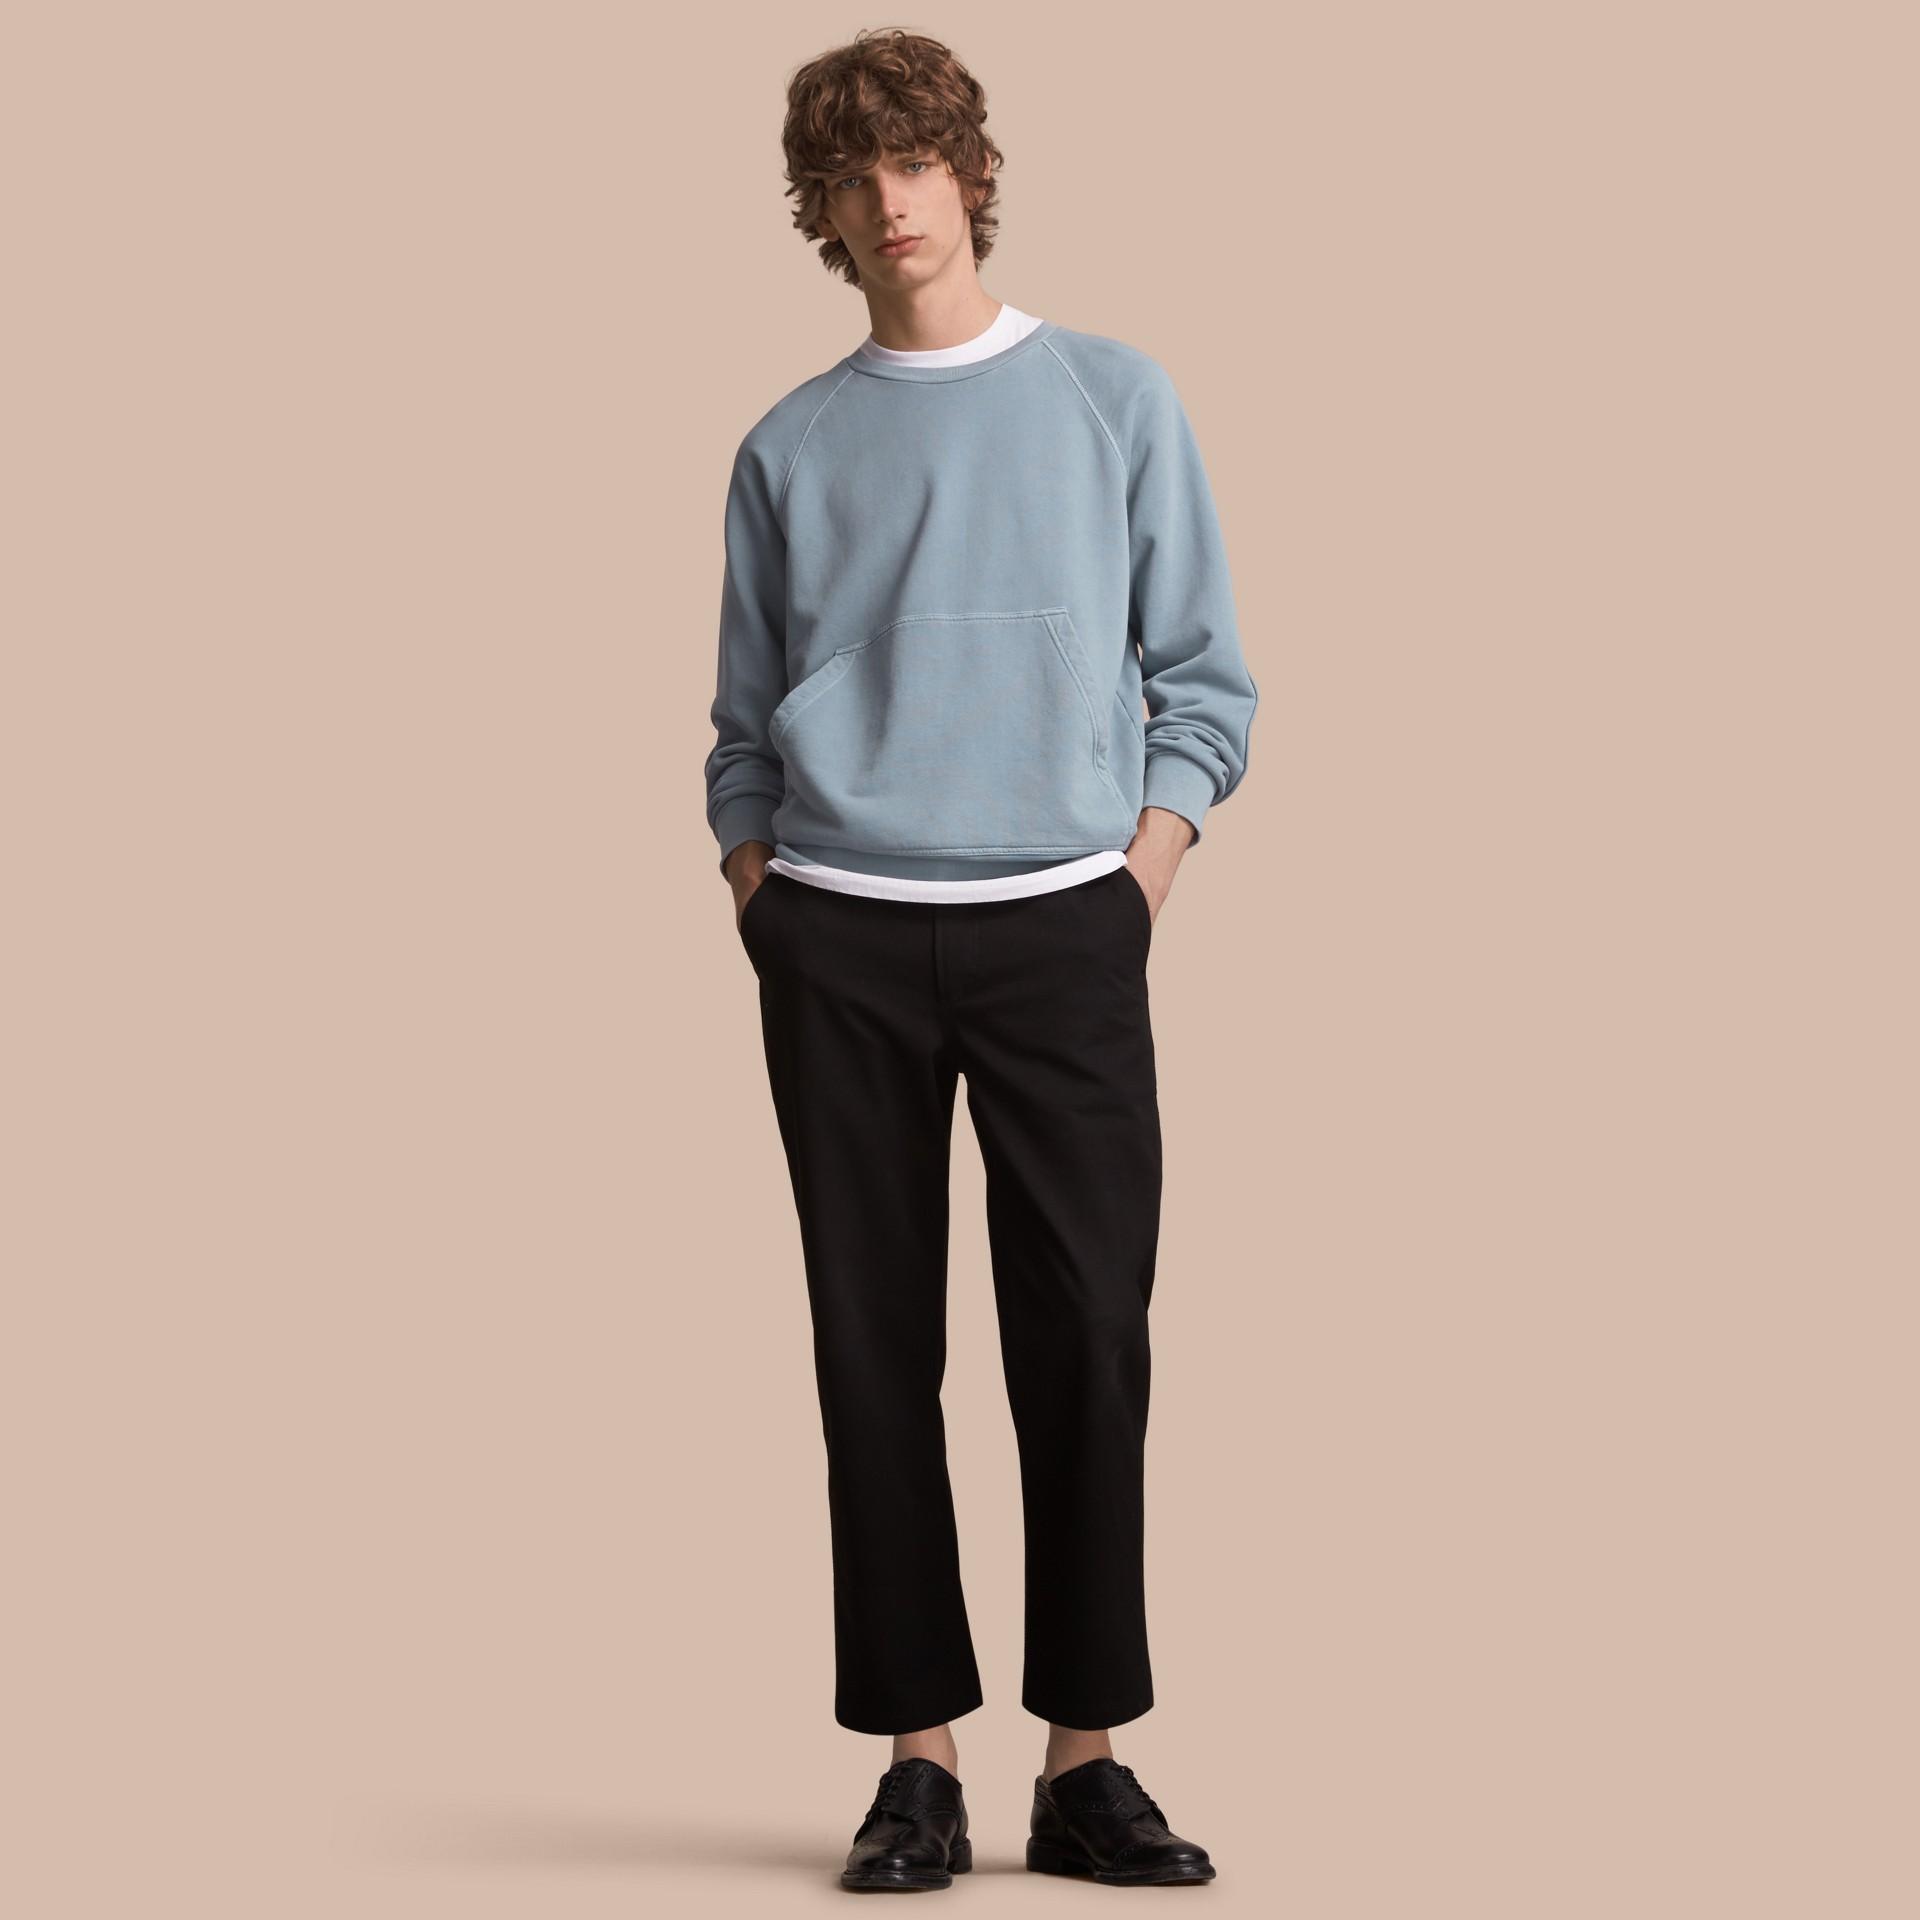 Unisex Pigment-dyed Cotton Oversize Sweatshirt in Dusty Blue - Women | Burberry Australia - gallery image 3